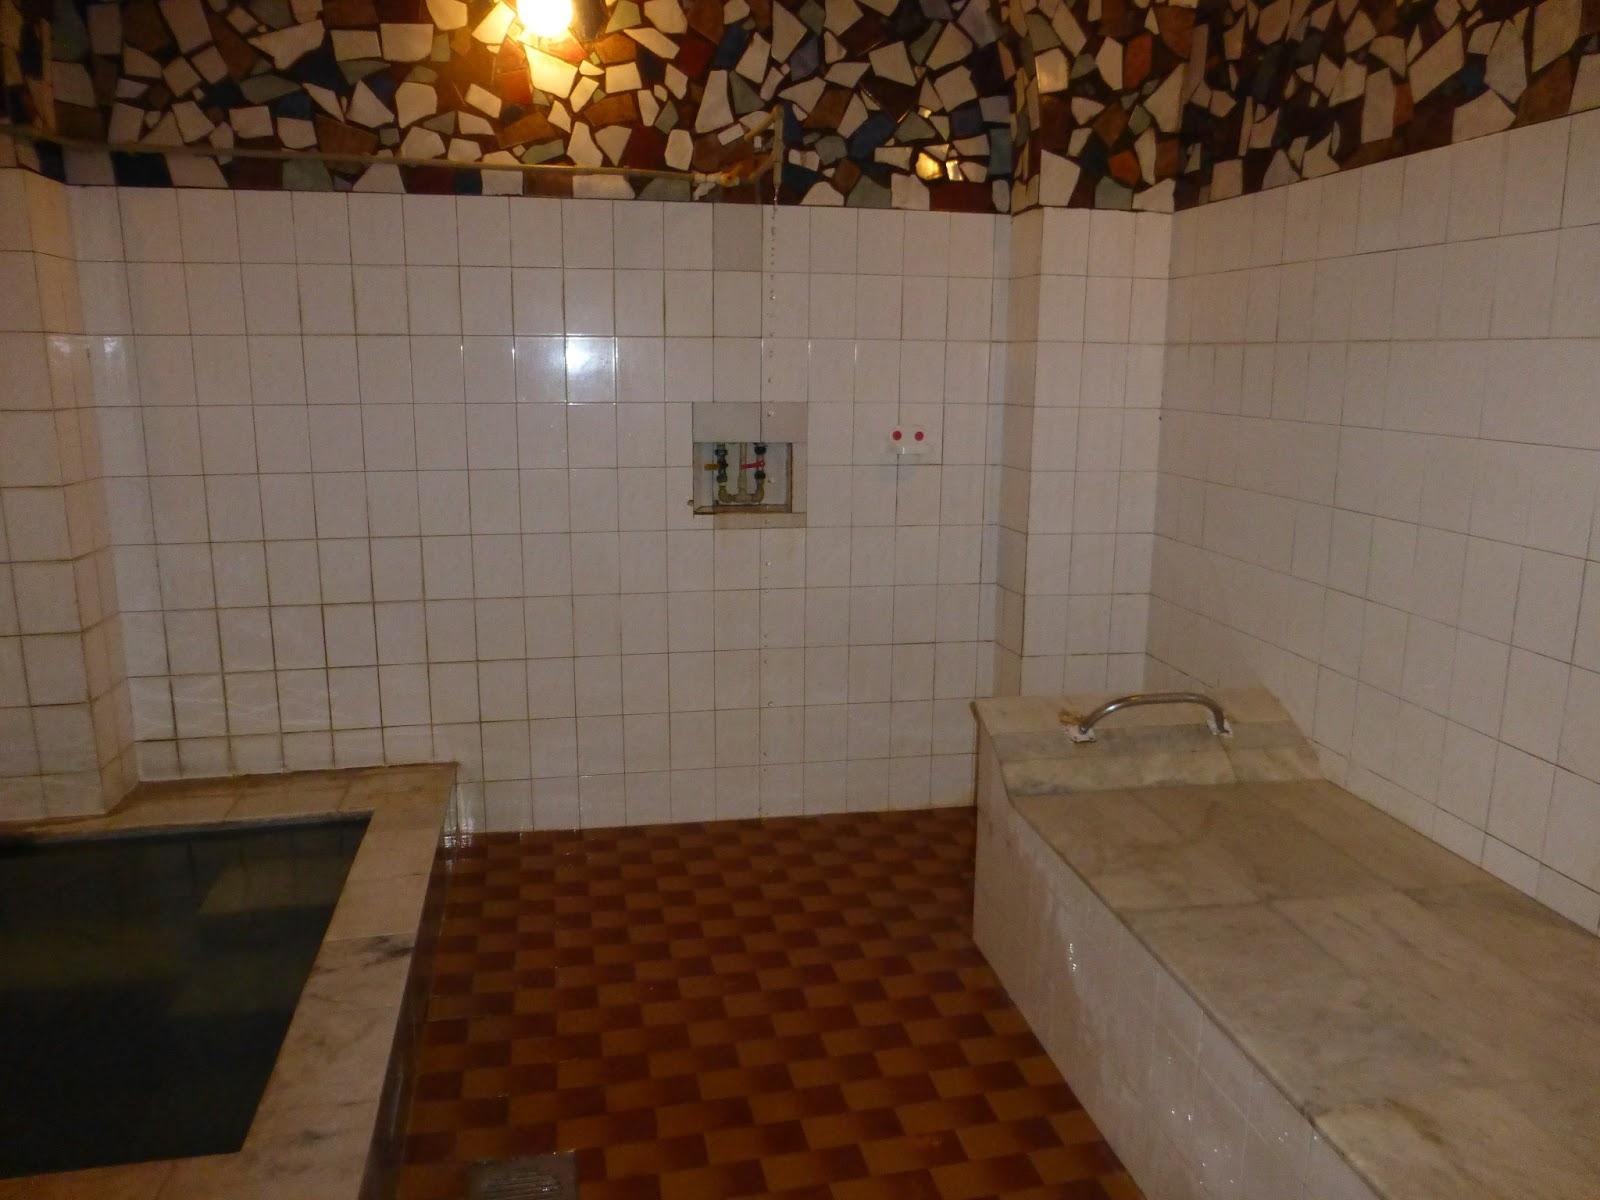 Christophers Expat Adventure Royal Bath Adventure - Royal bath tubs